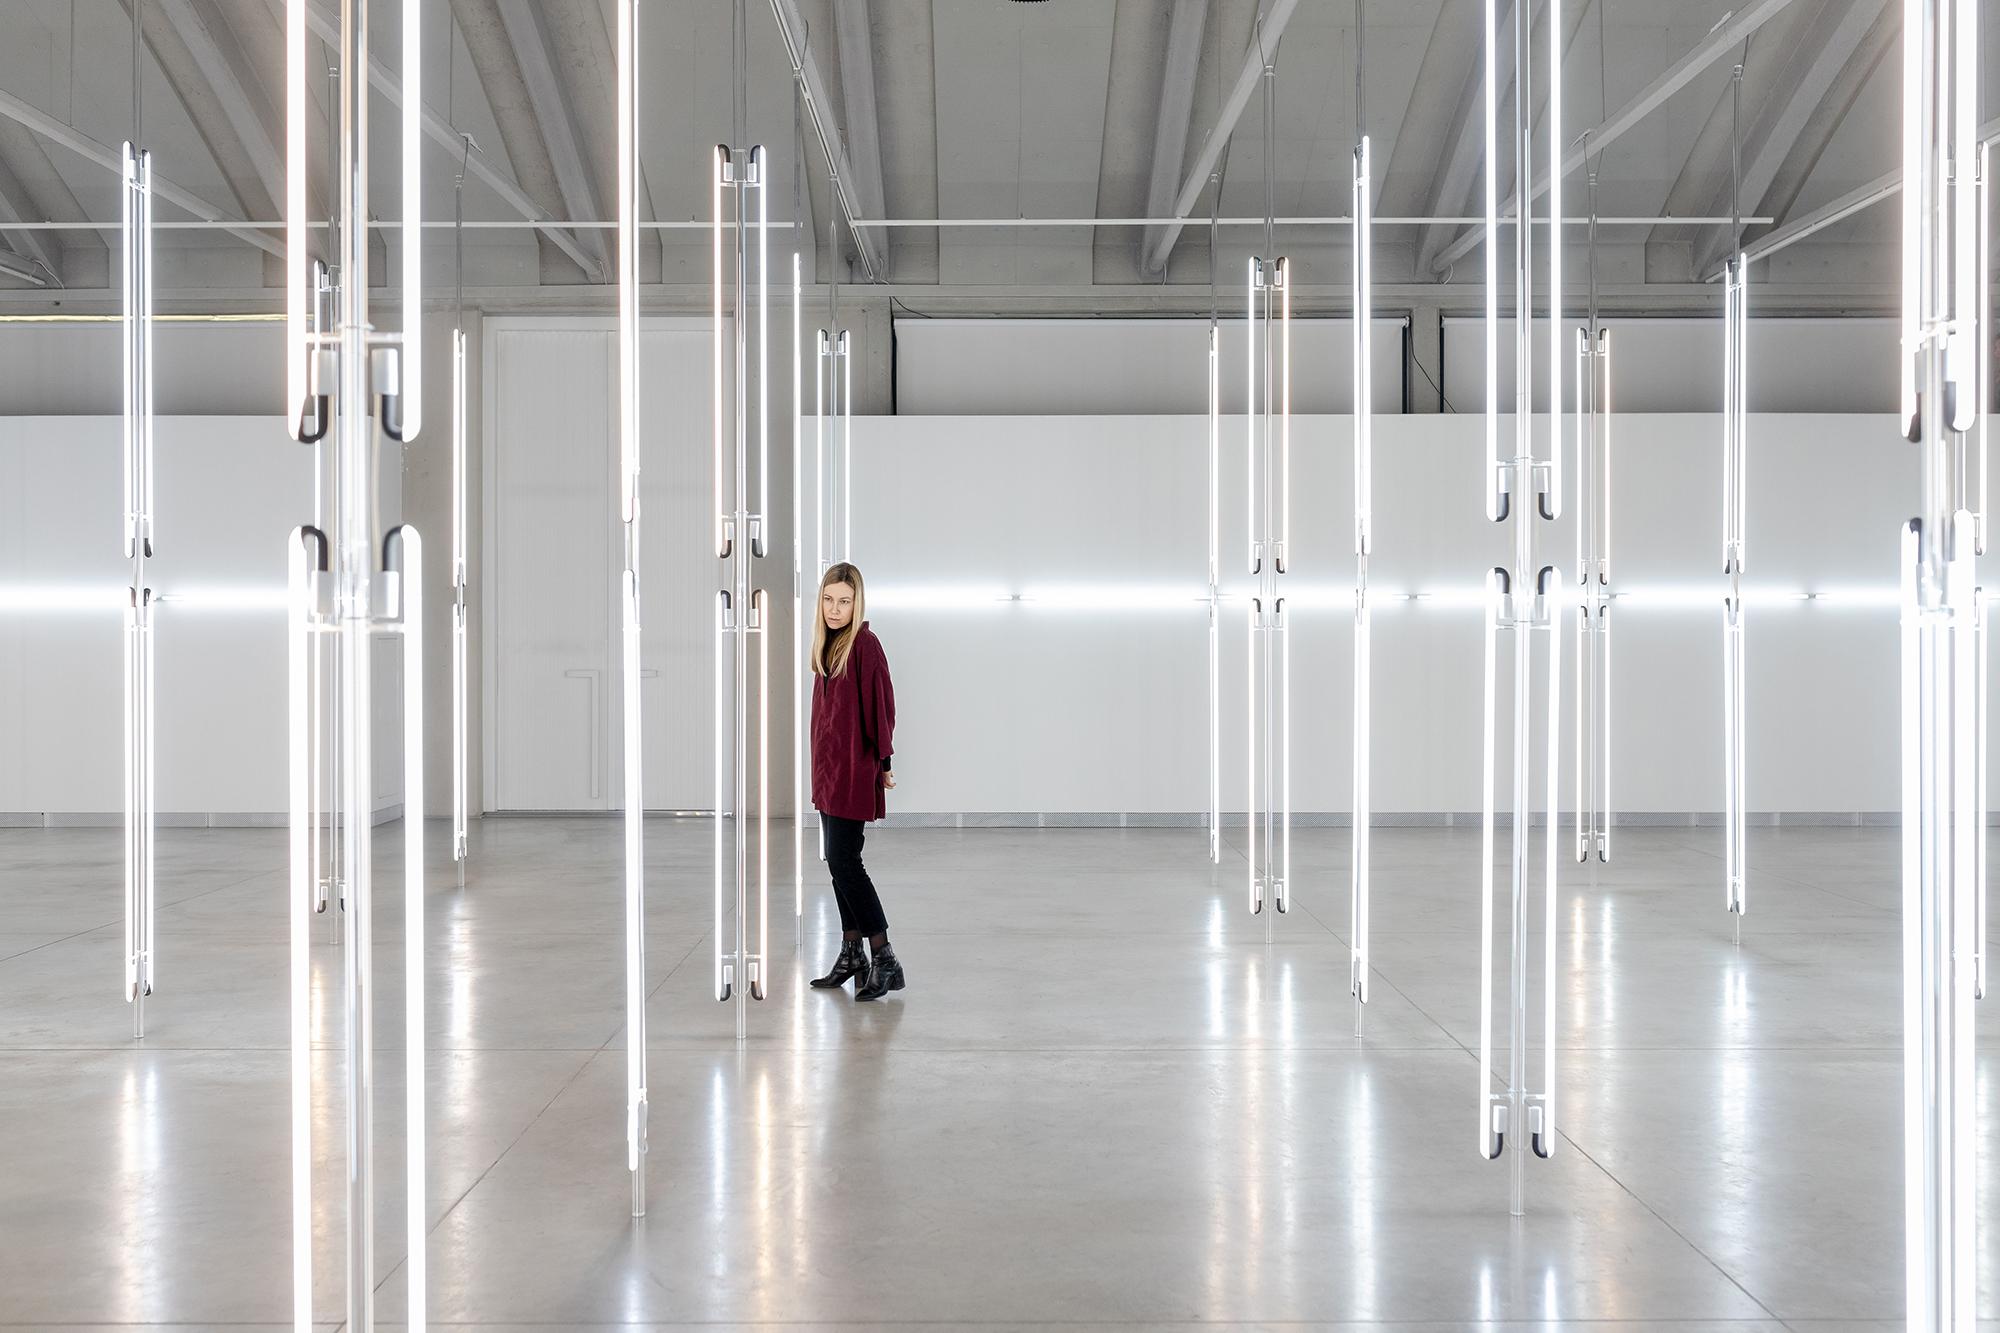 Anne Katrine Senstadi valgusinstallatsioon Kai kunstikeskuses. Foto: Renee Altrov